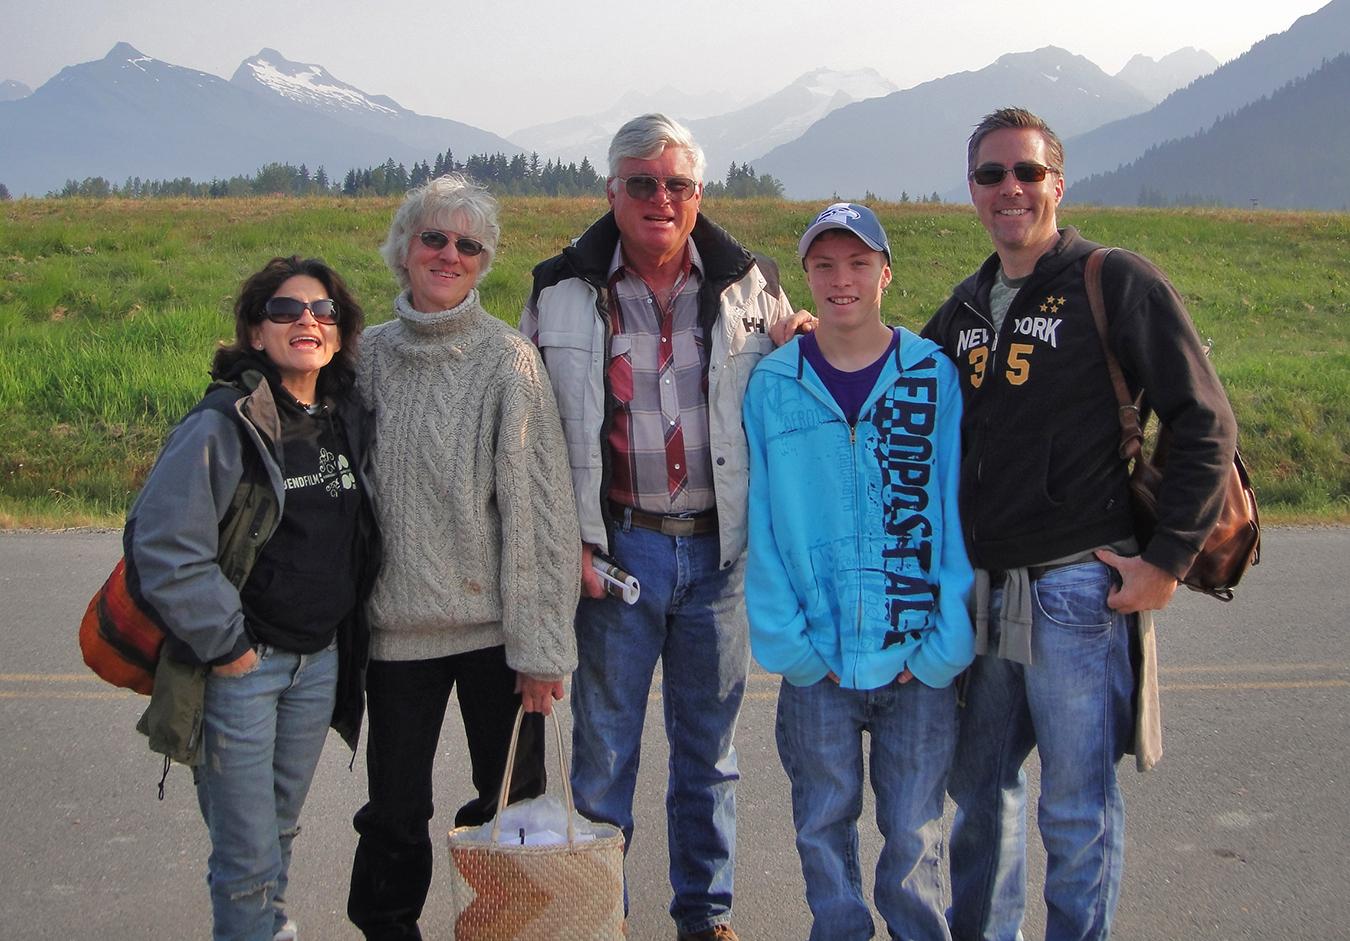 Gitta, Cathy, Ed, Scott Ramsay